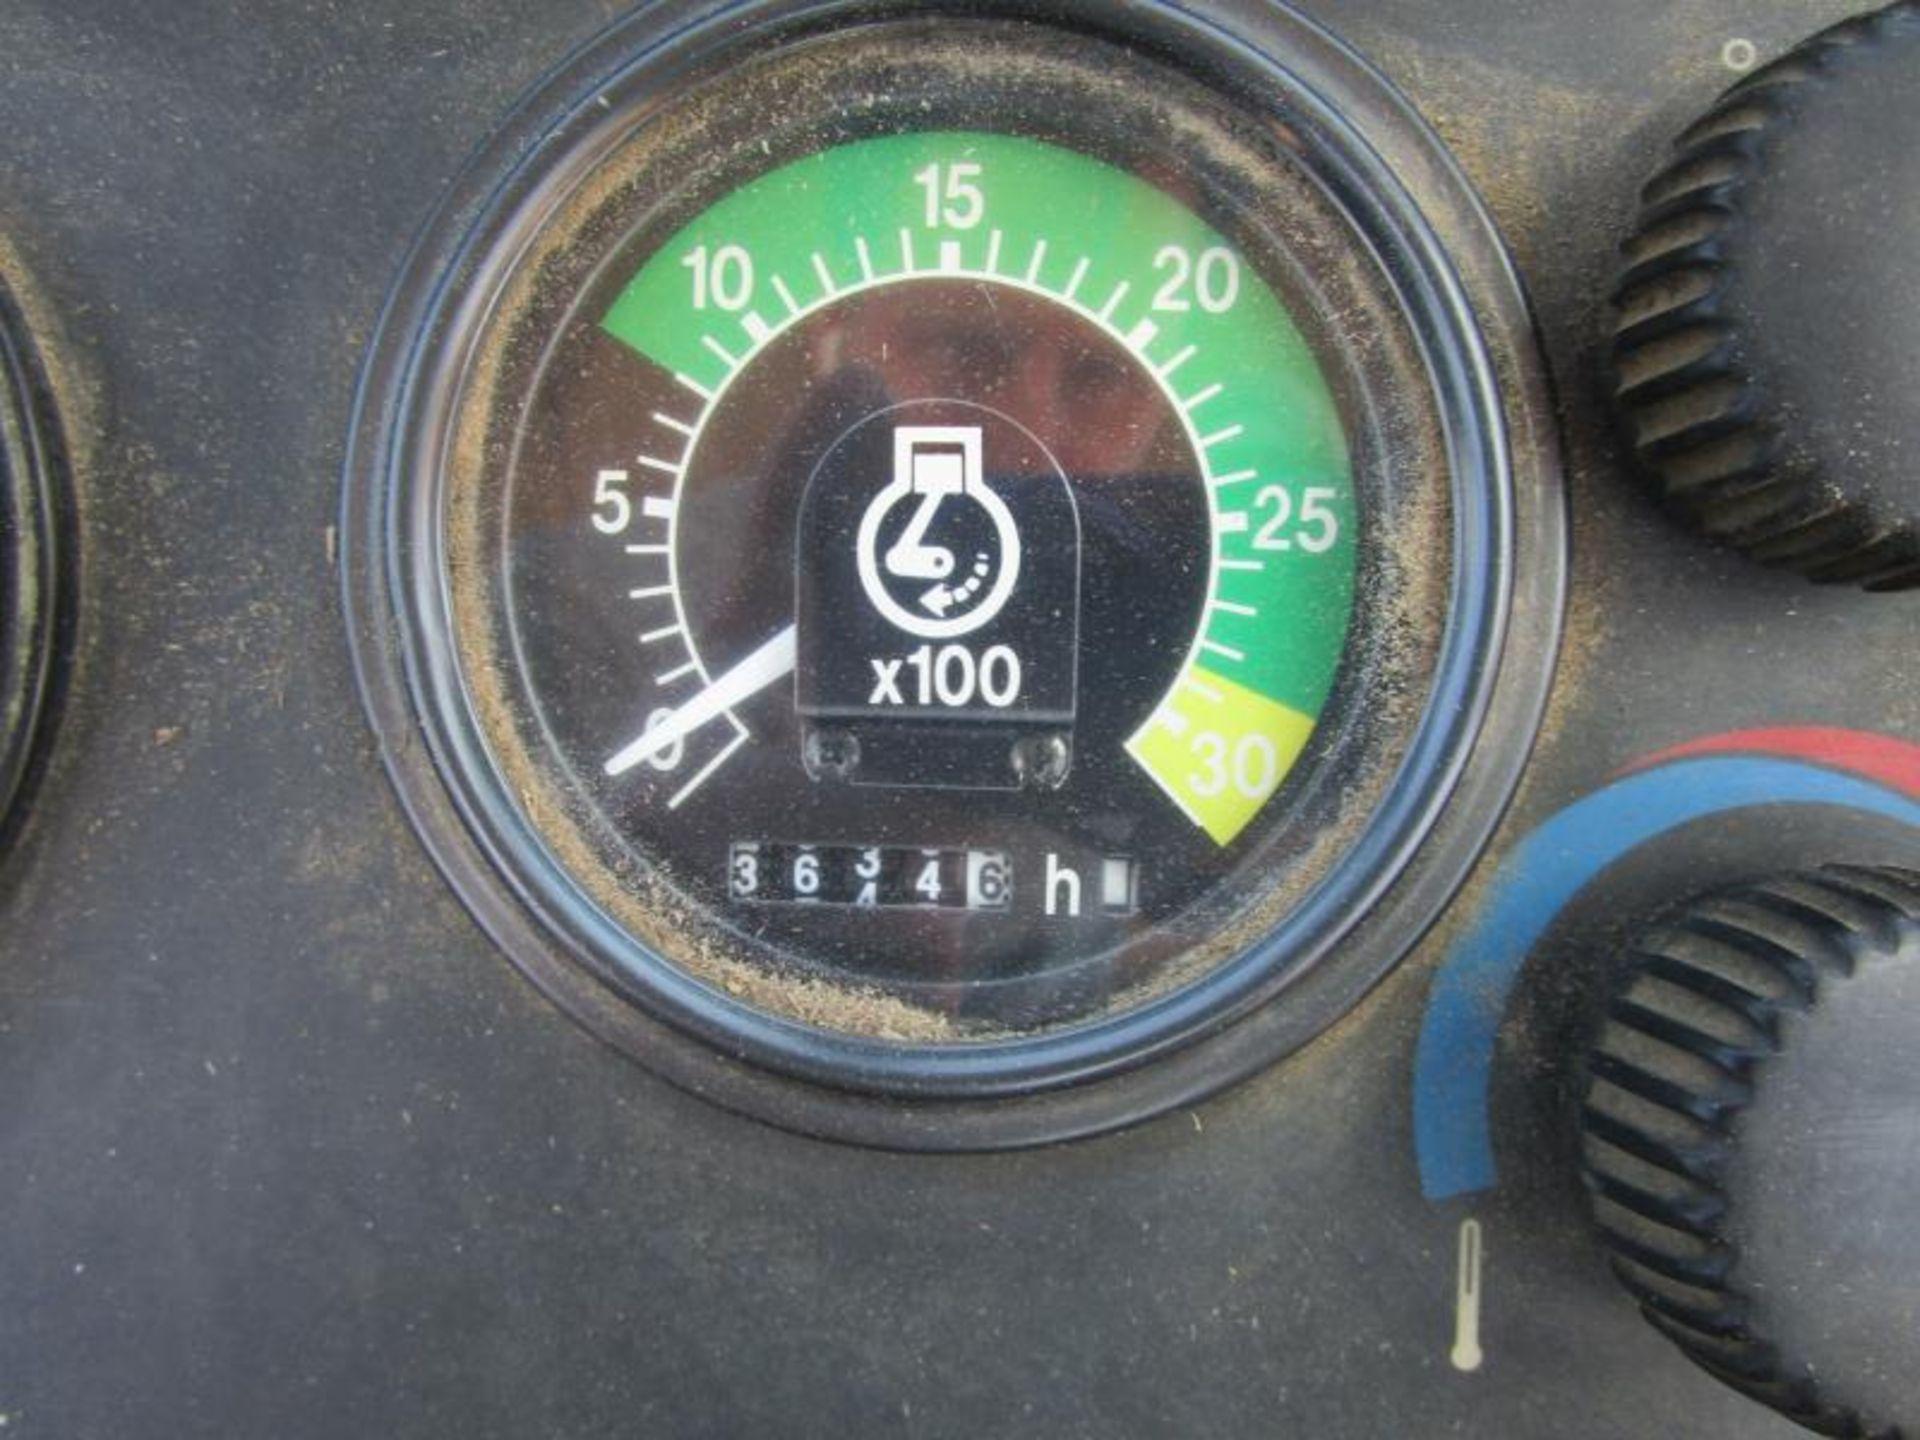 John Deere 410E, Turbo 4x4, 3,644 hours - Image 10 of 14